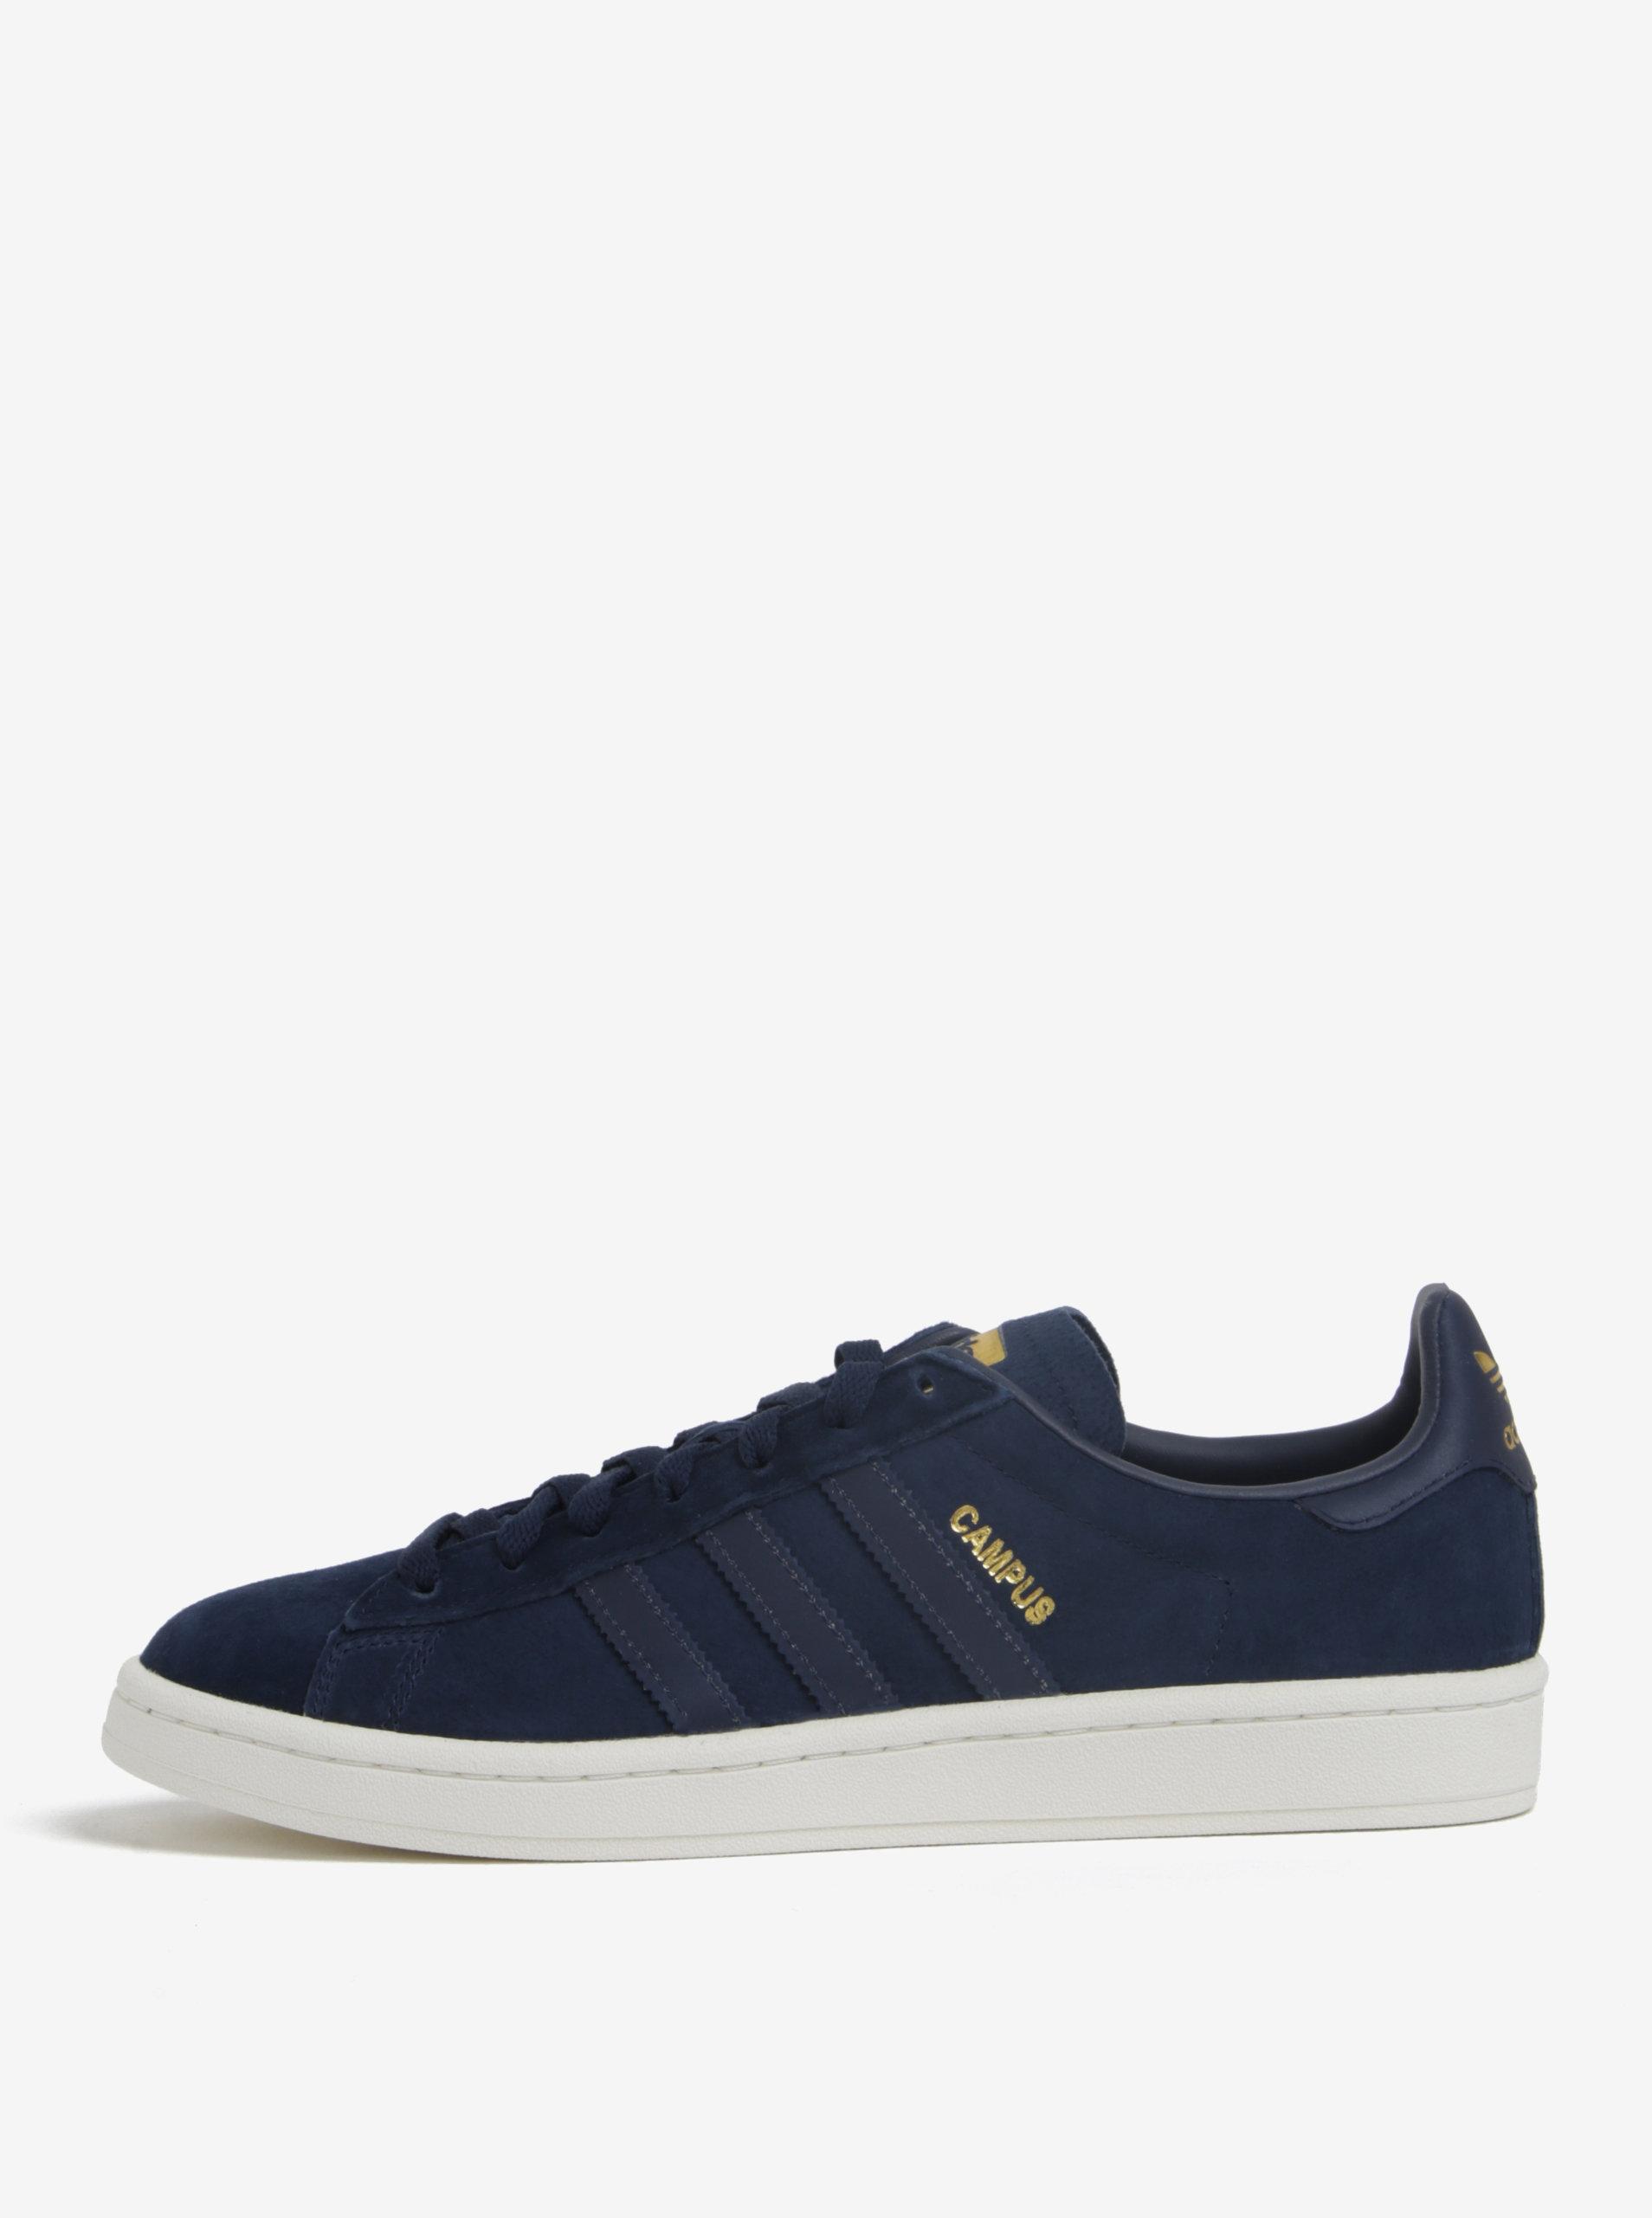 97e804d1a80 Tmavě modré pánské semišové tenisky adidas Originals Campus ...